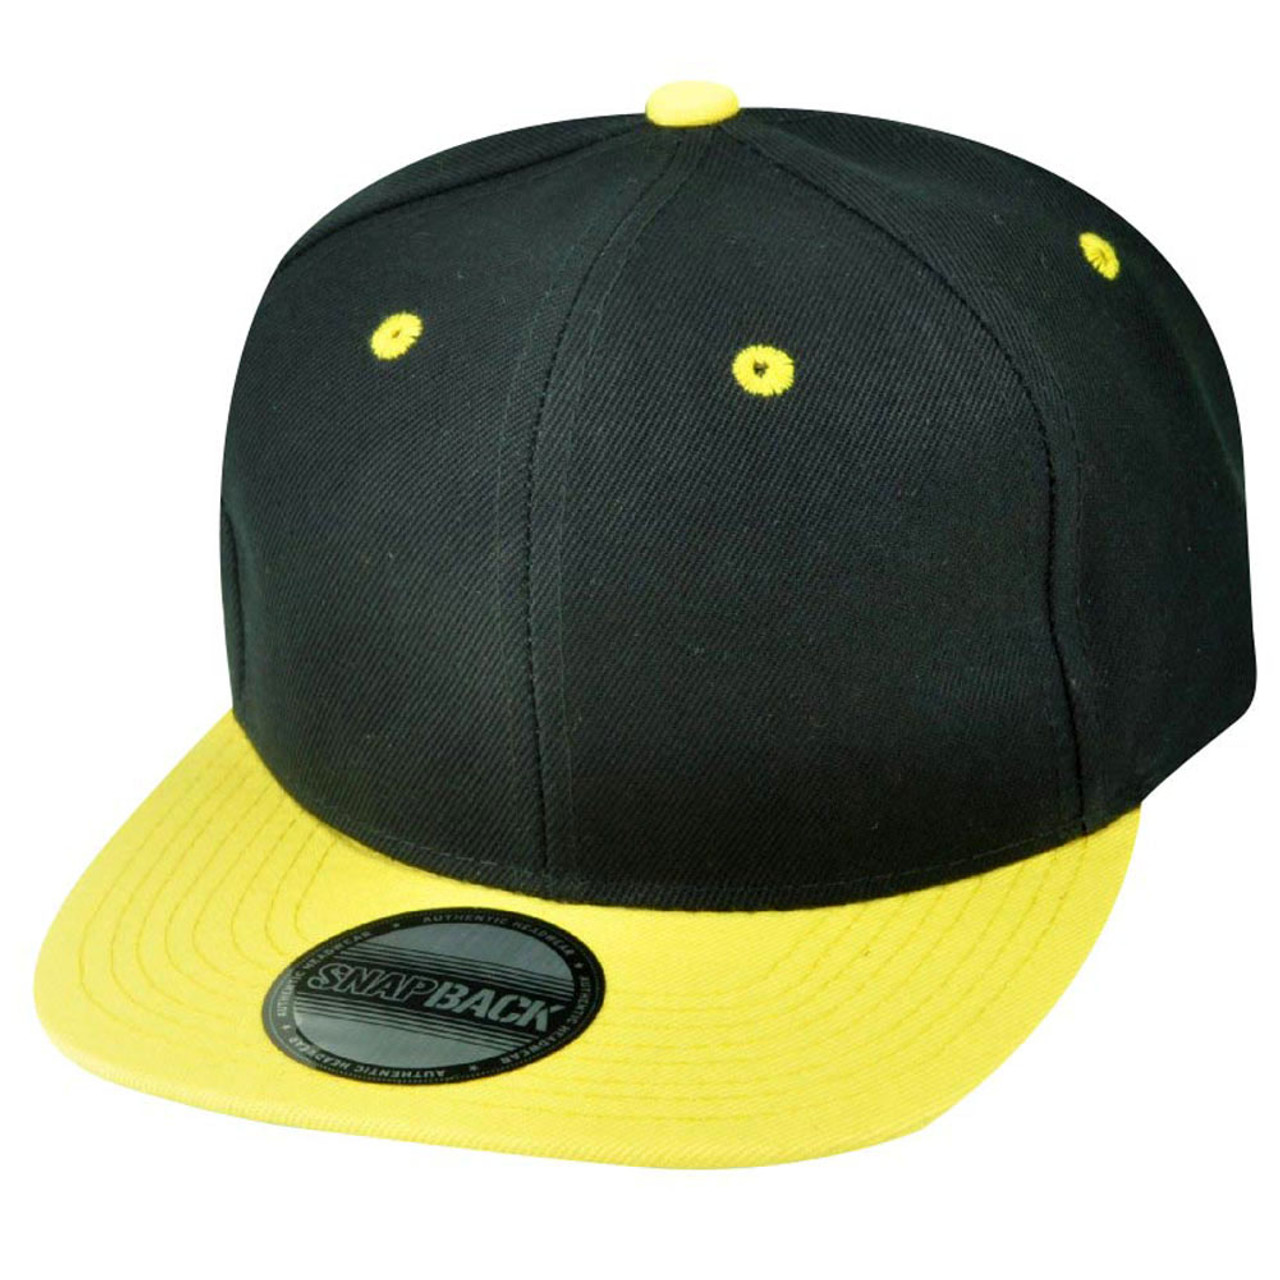 691d08ee8612e Blank Plain Two Tone Black Yellow Adjustable Snapback Flat Bill Acrylic Hat  Cap - Cap Store Online.com